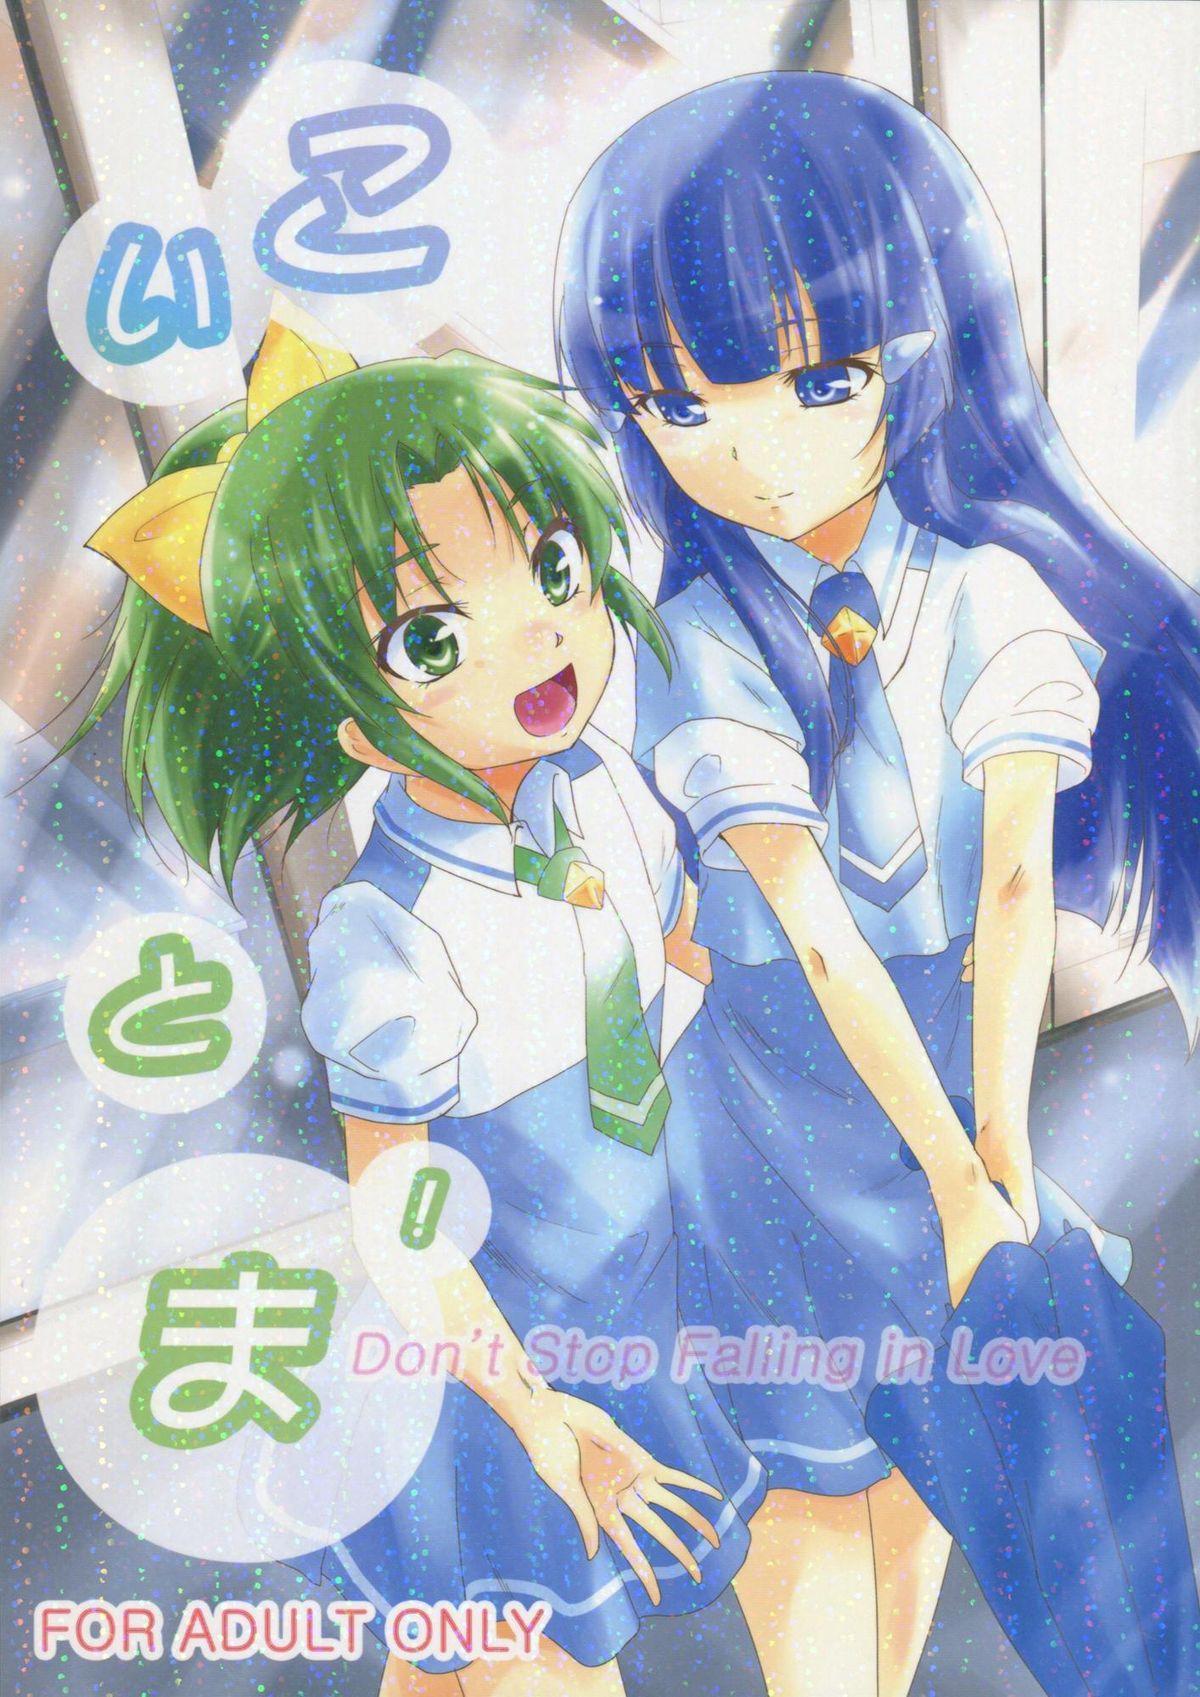 Koitoma! Don't Stop Falling in Love 0